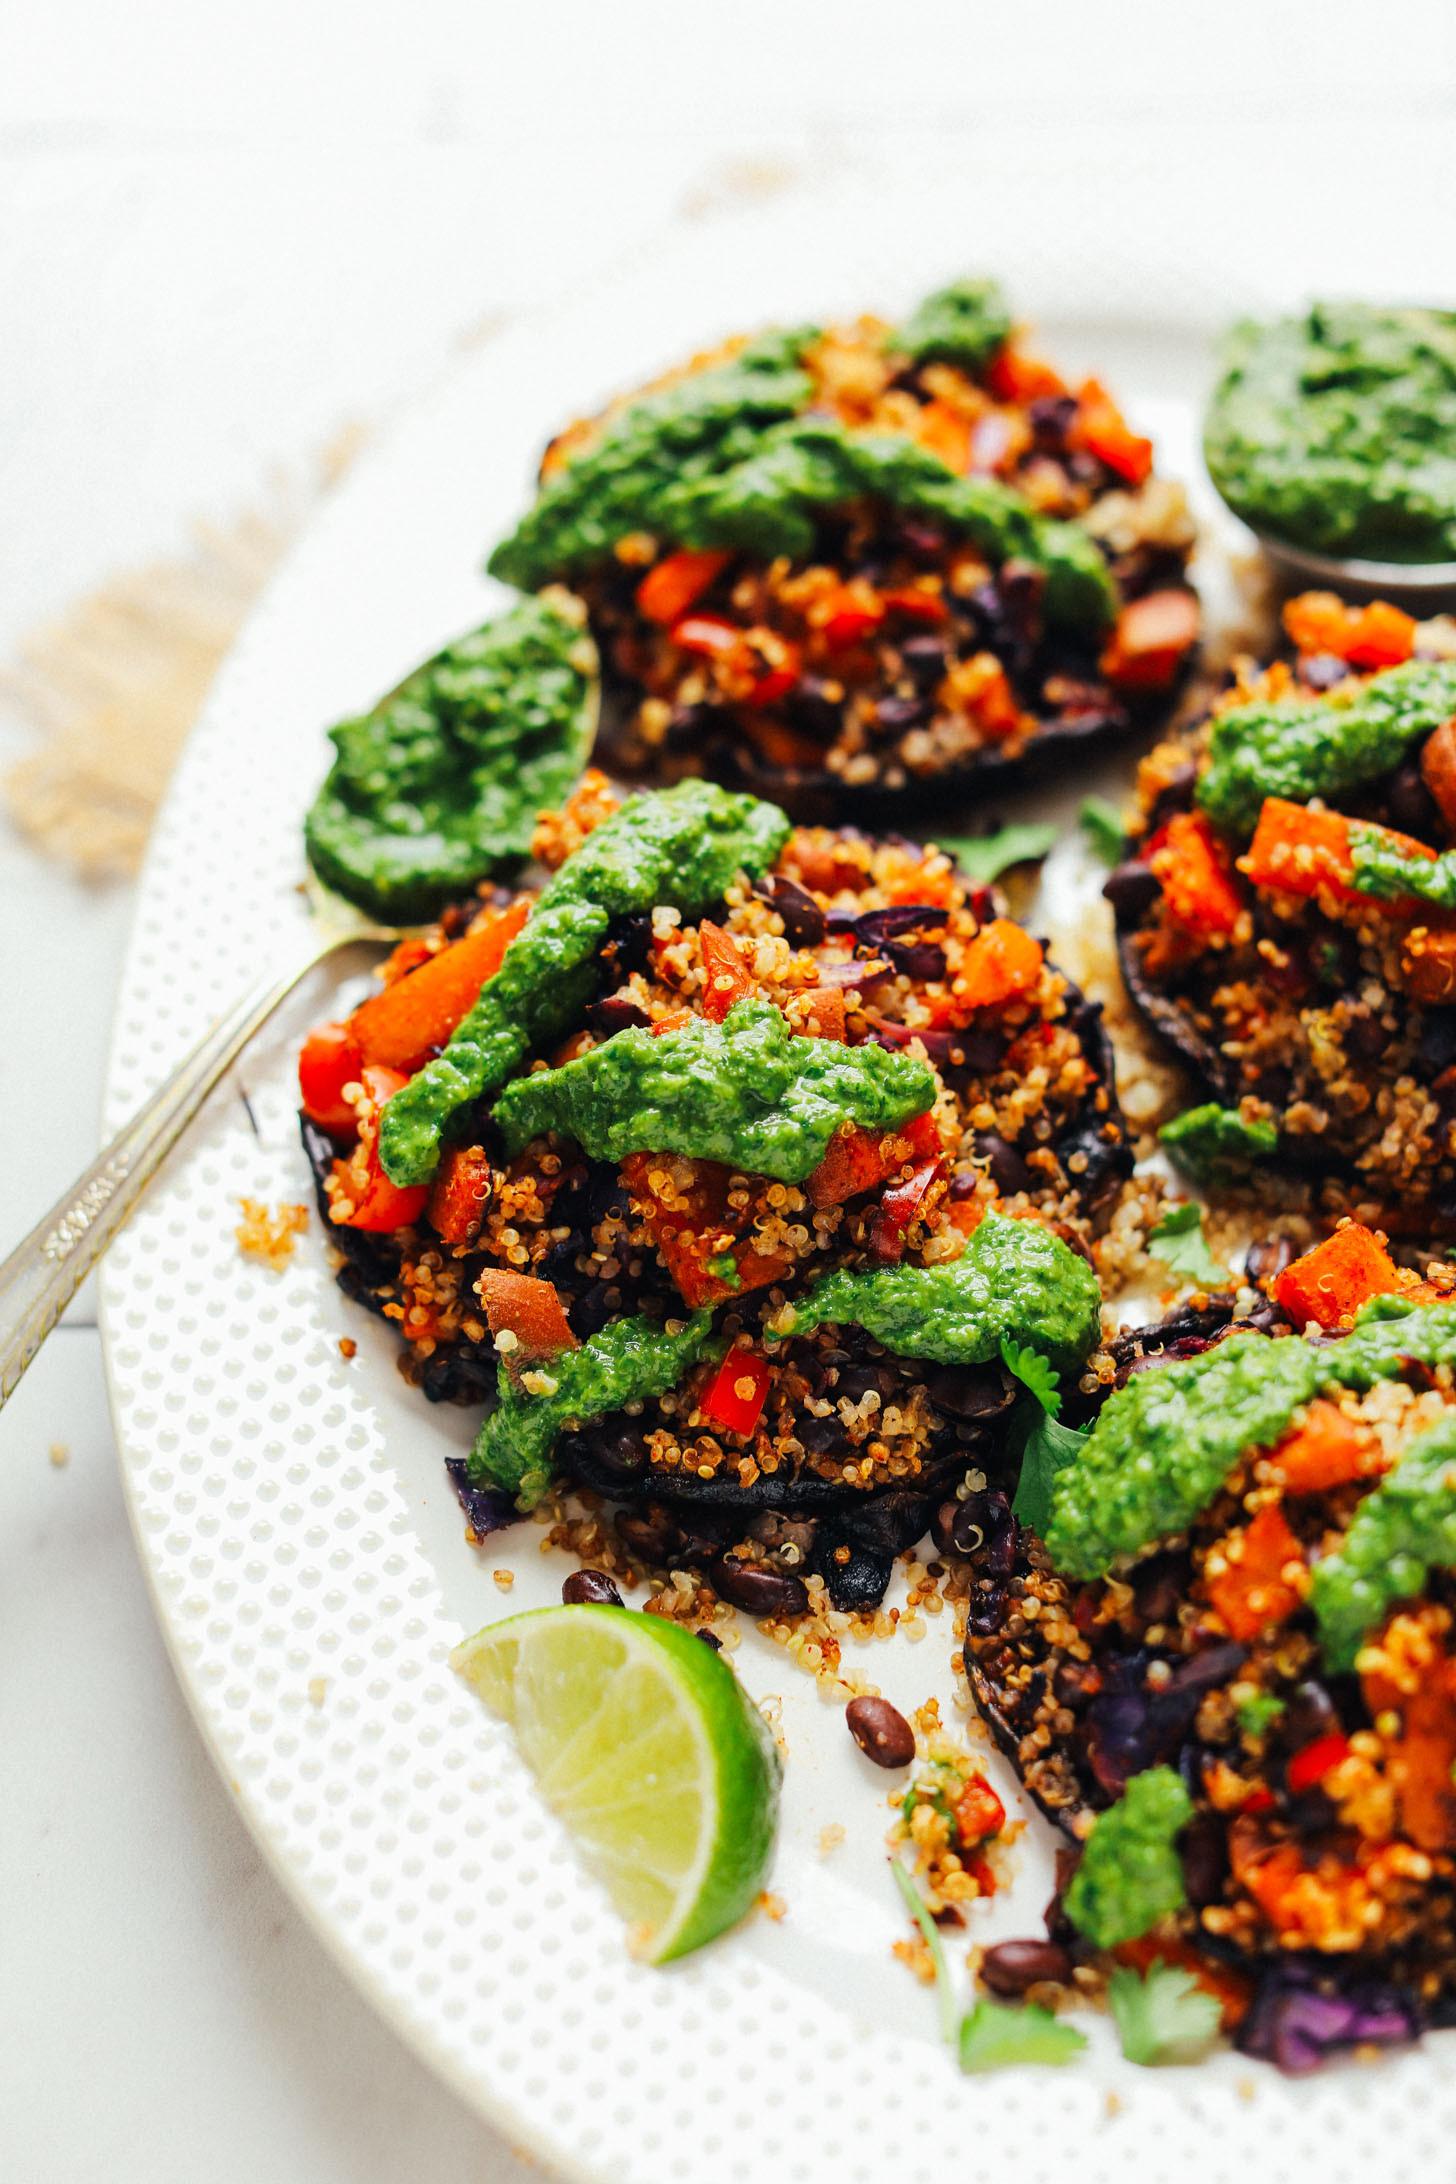 Vegan Portobello Recipes  Quinoa & Ve able Stuffed Mushrooms